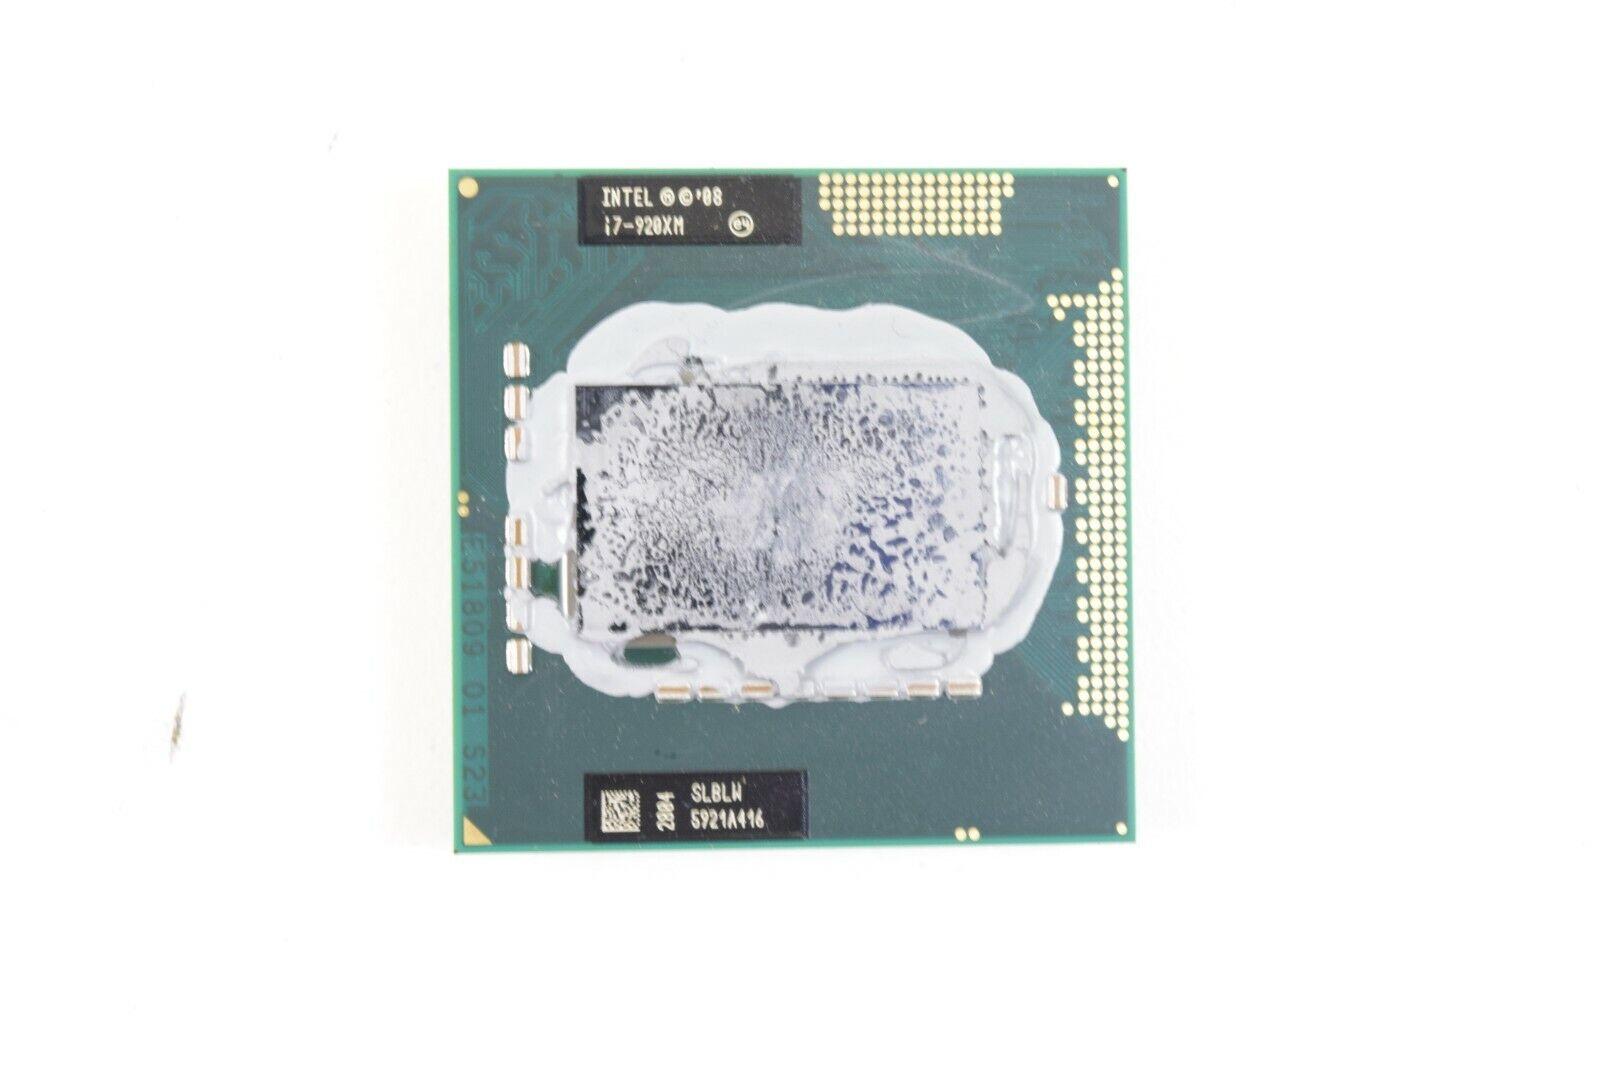 INTEL EXTREME CORE I7 2920XM 2.5GHZ 8MB CACHE SOCKET G2 LAPTOP CPU SR02E *Tested